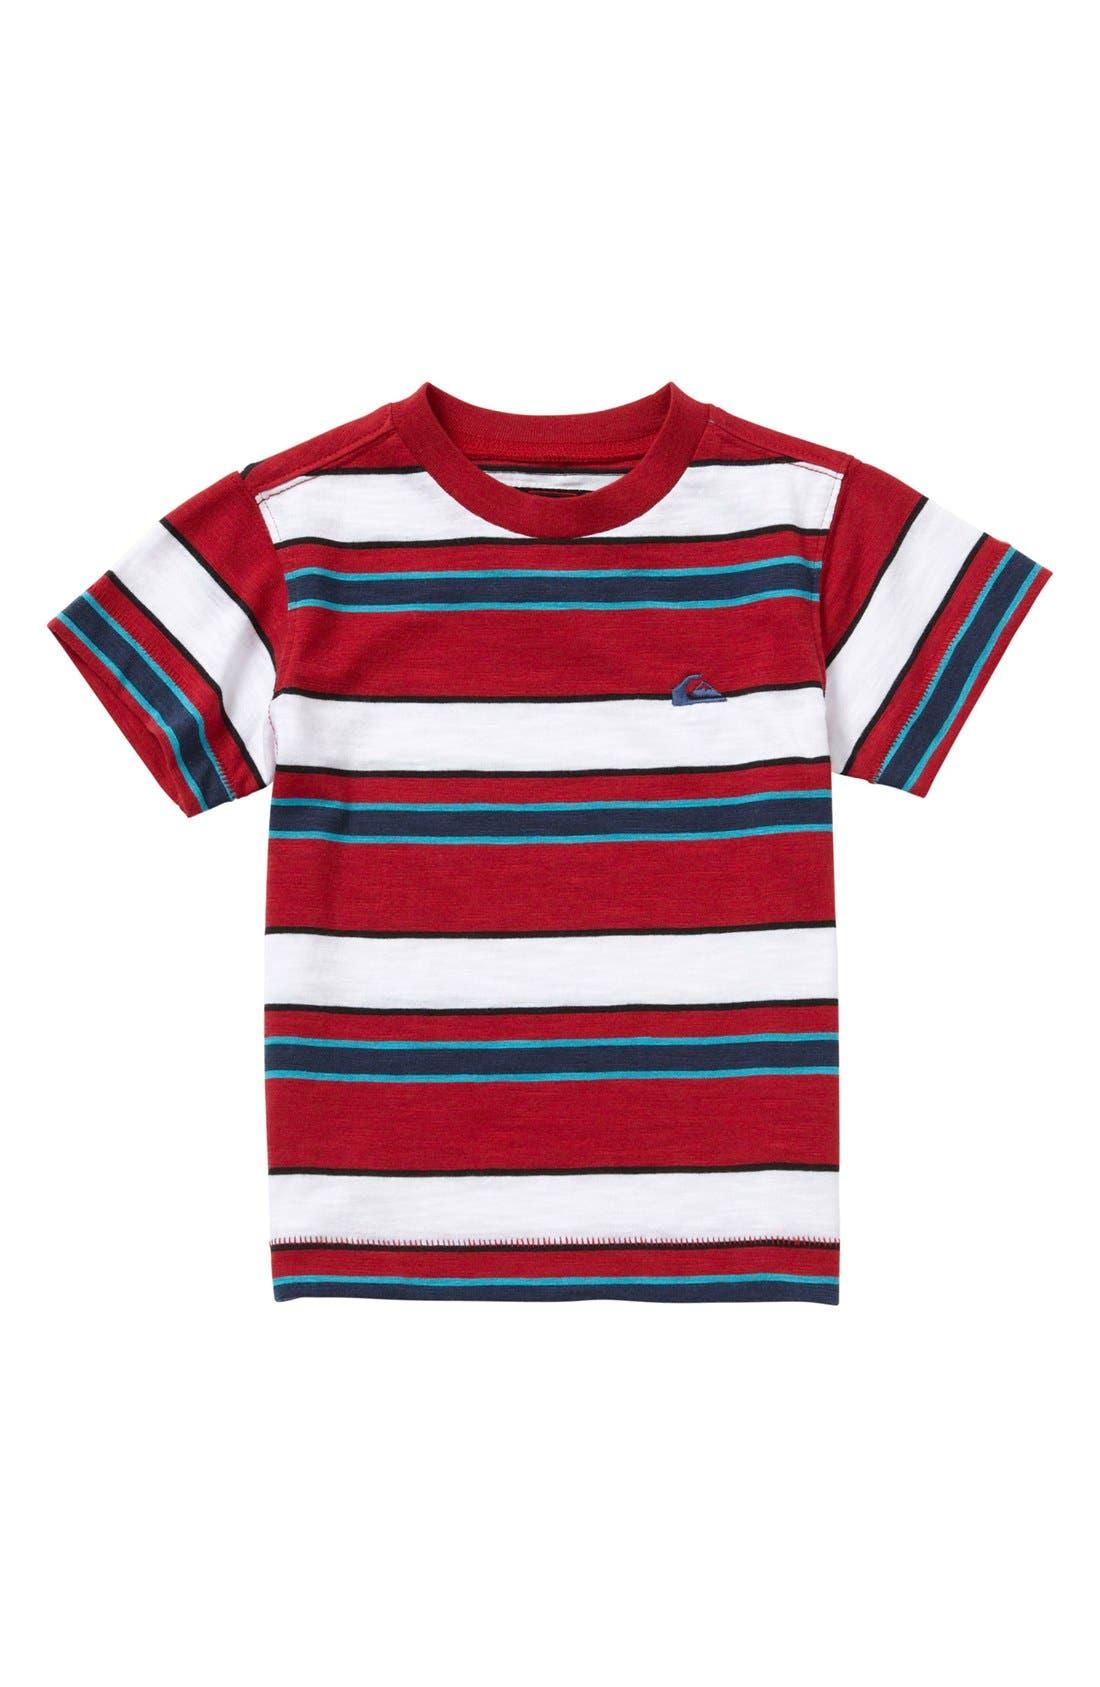 Main Image - Quiksilver 'Eld Street' T-Shirt (Baby Boys)